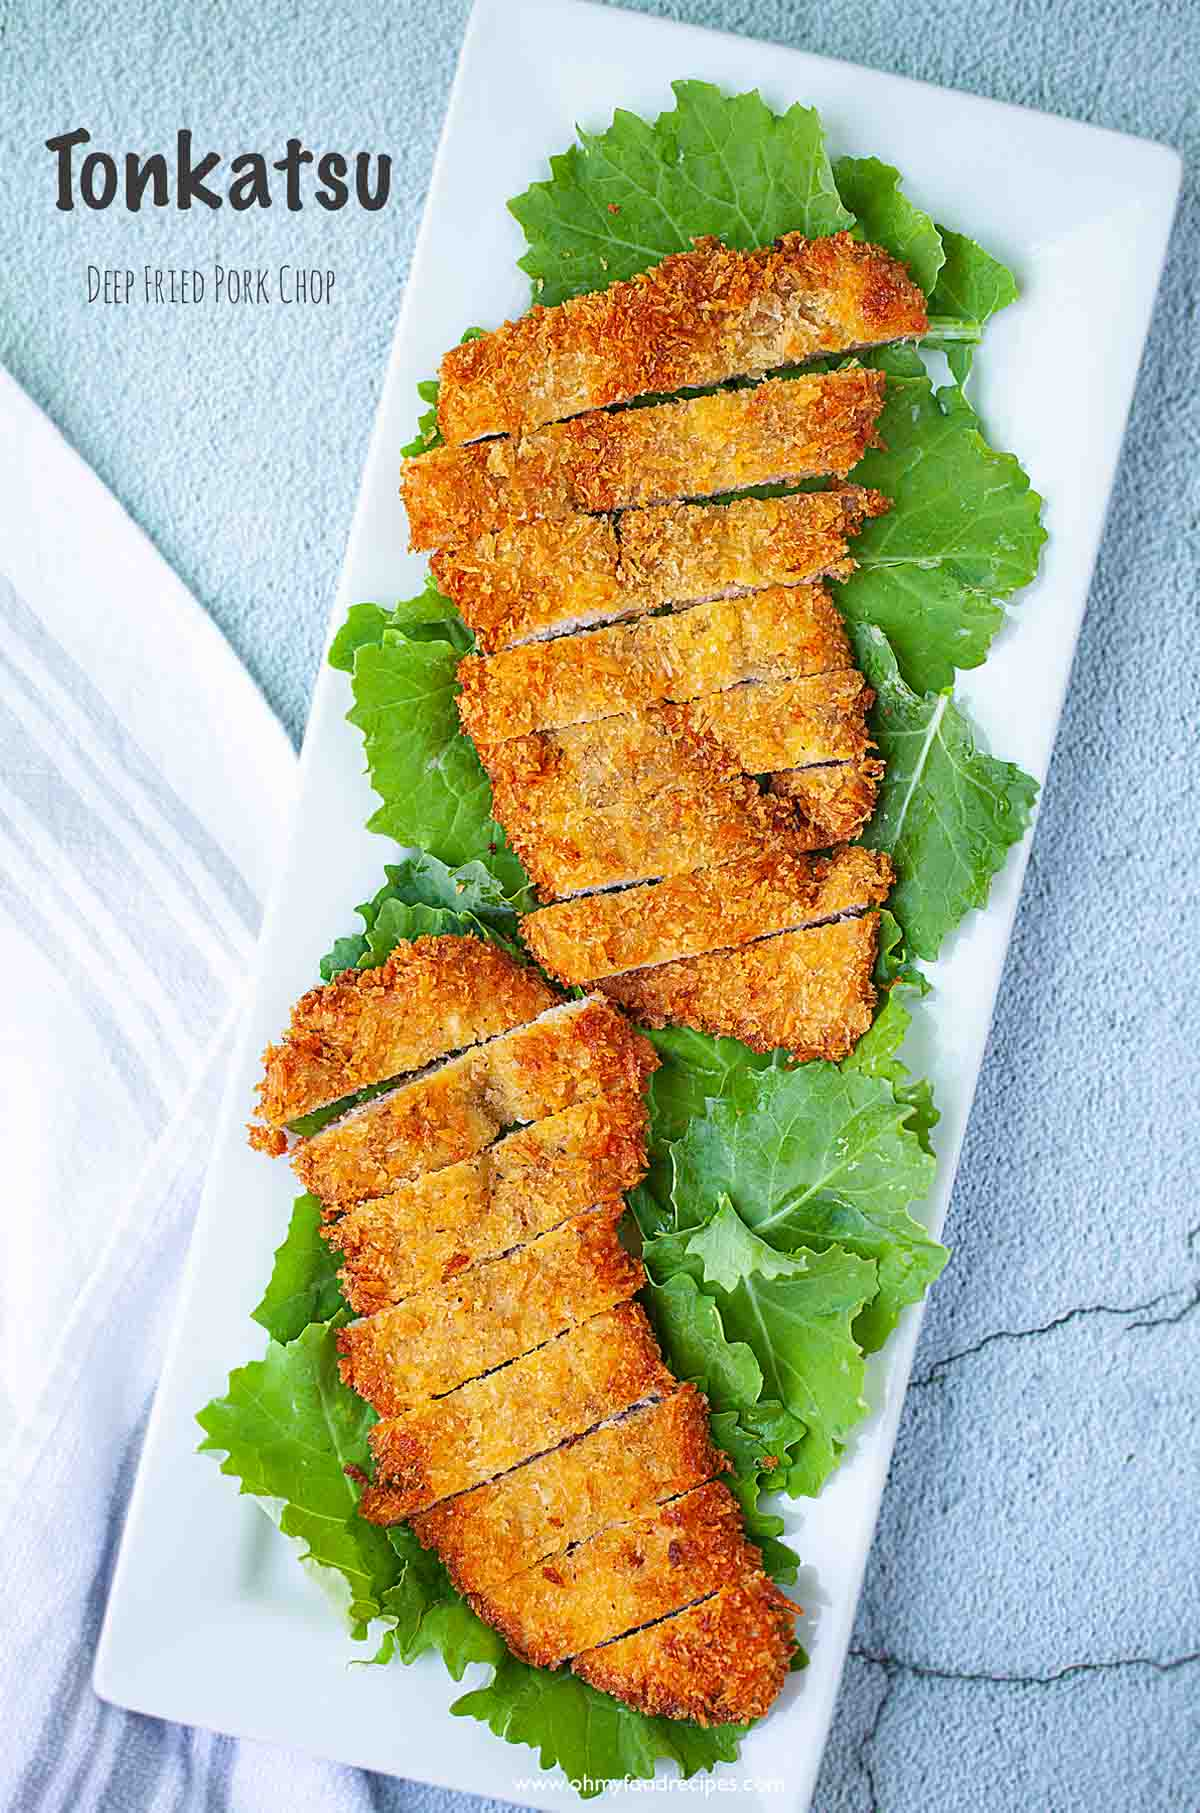 Japanese tonkatsu deep fried pork cutlets cut up on kale top view